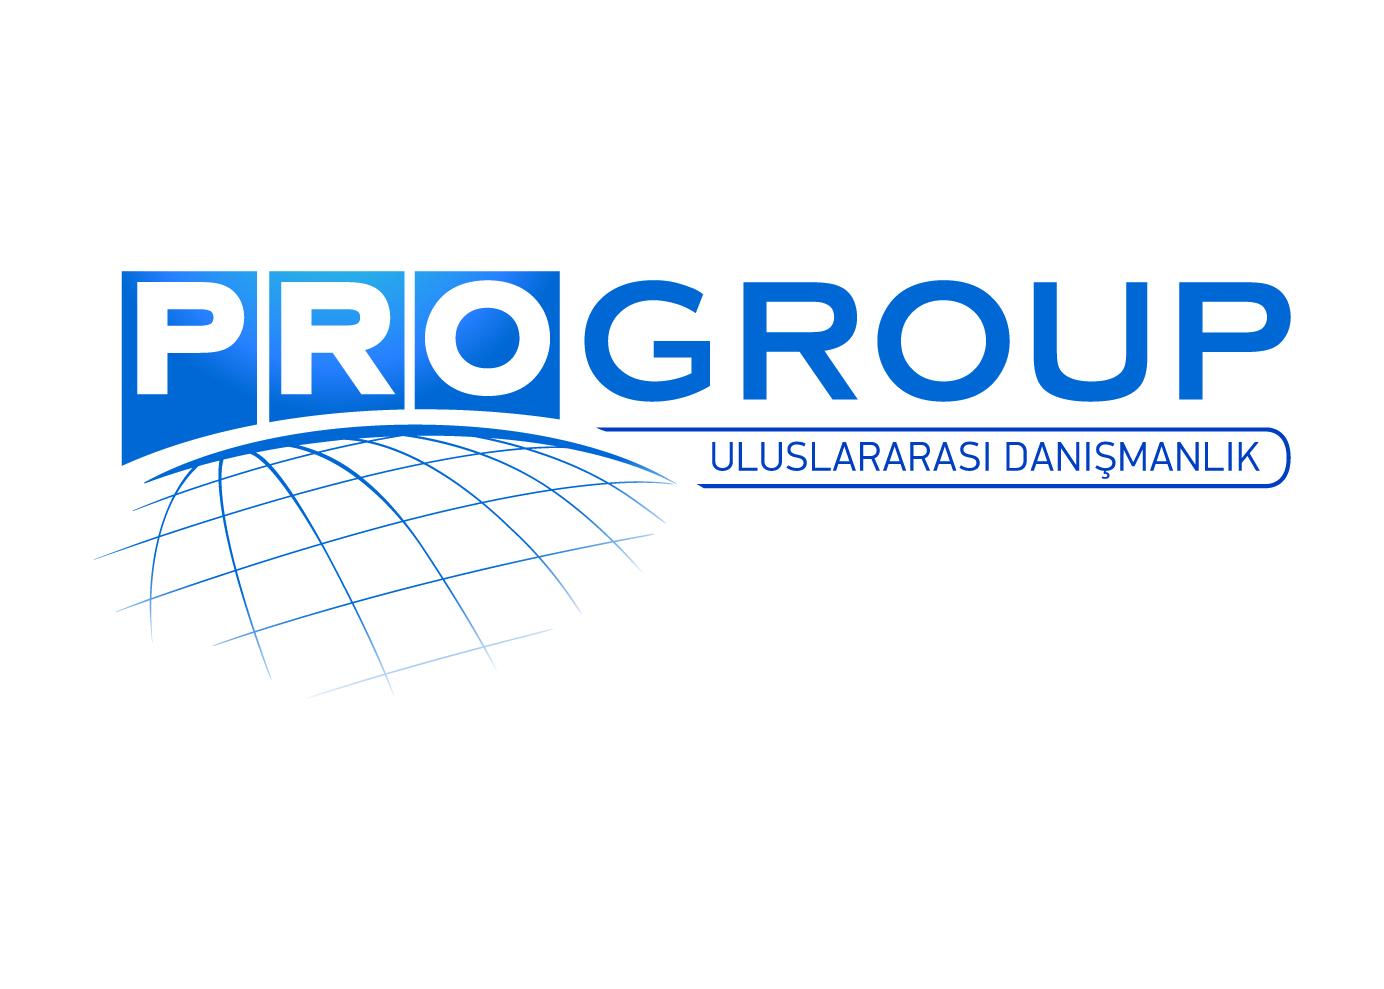 progroup_logo-01